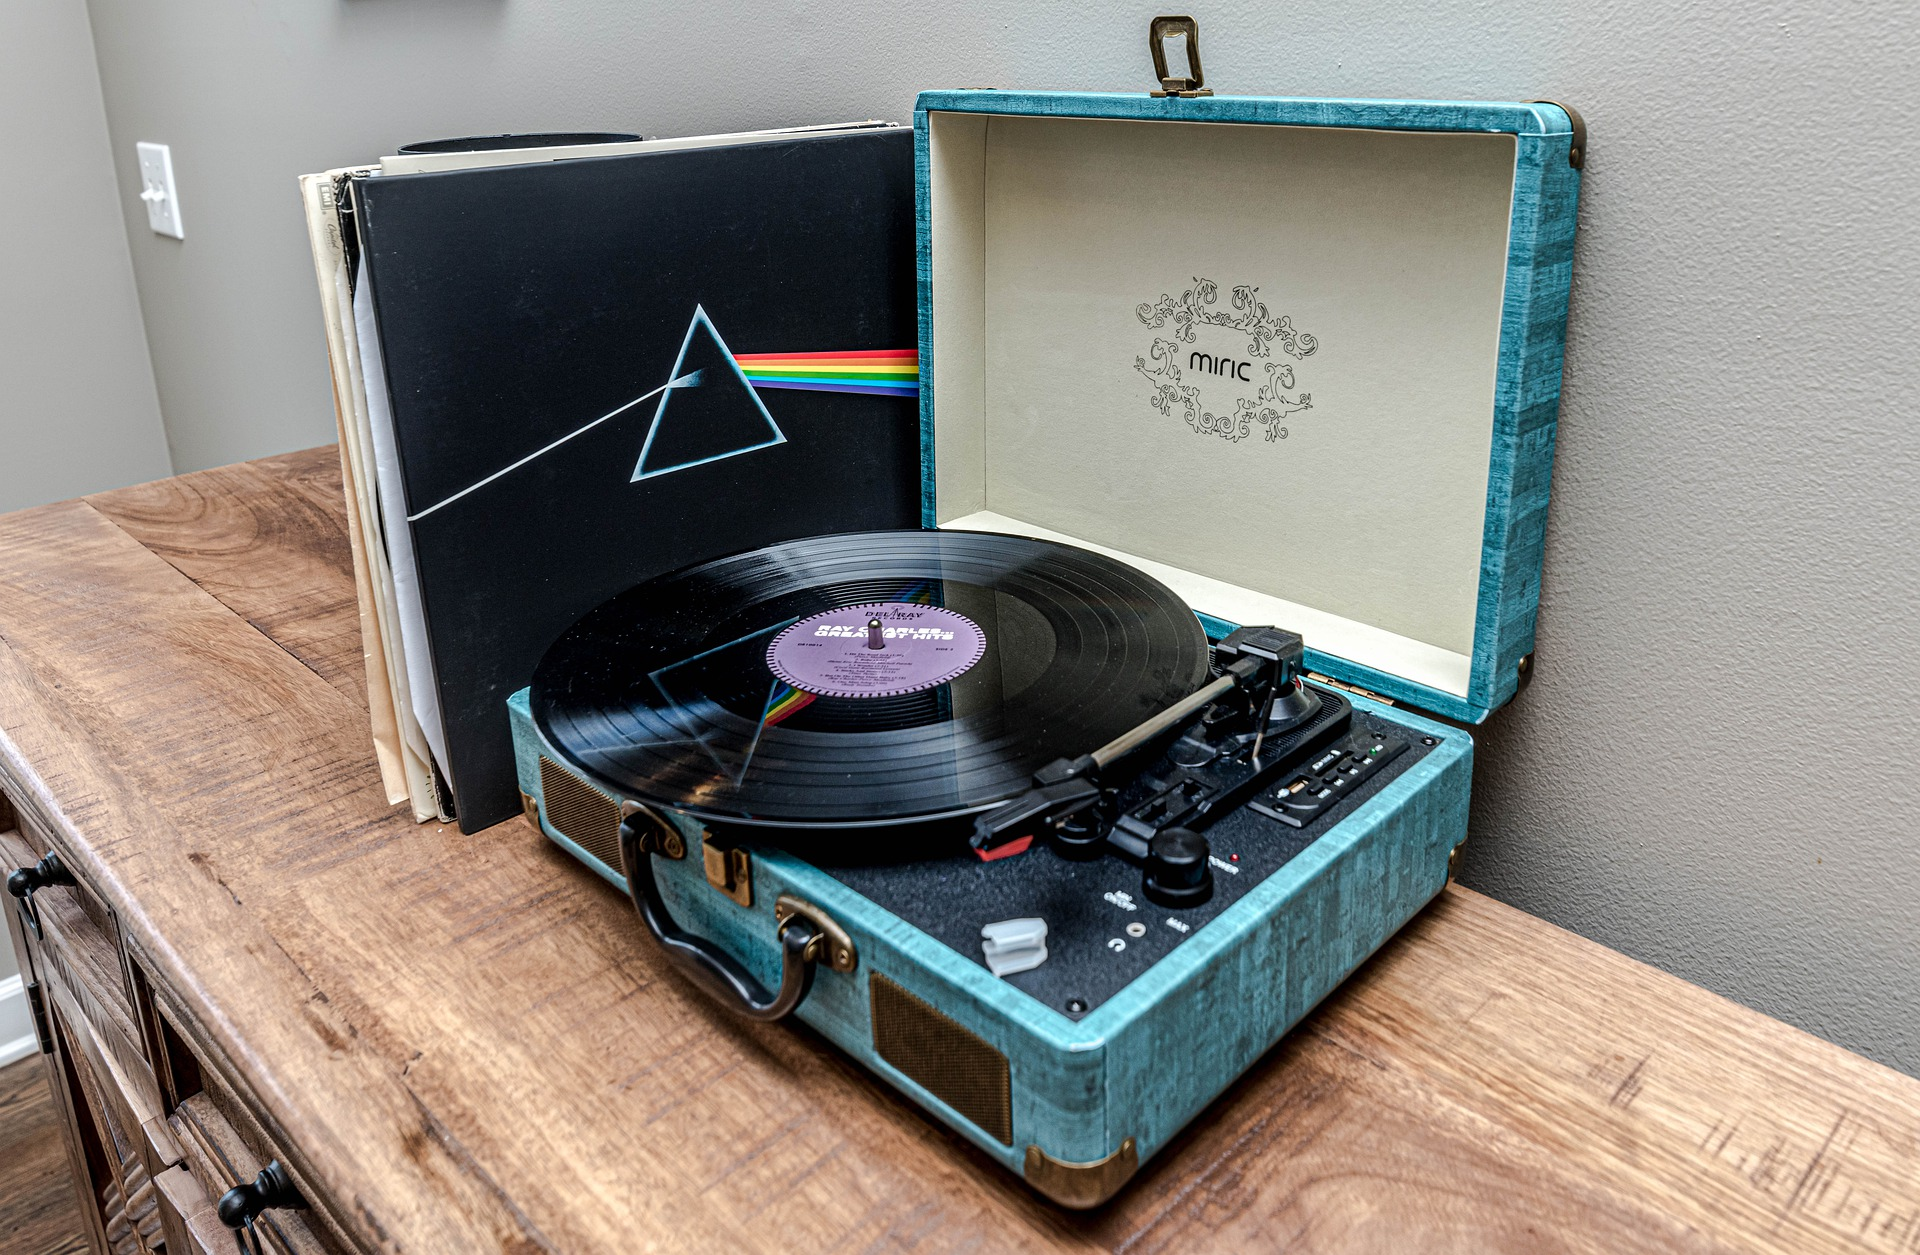 pink floyd vinyl 1920x1255 - Free image bank